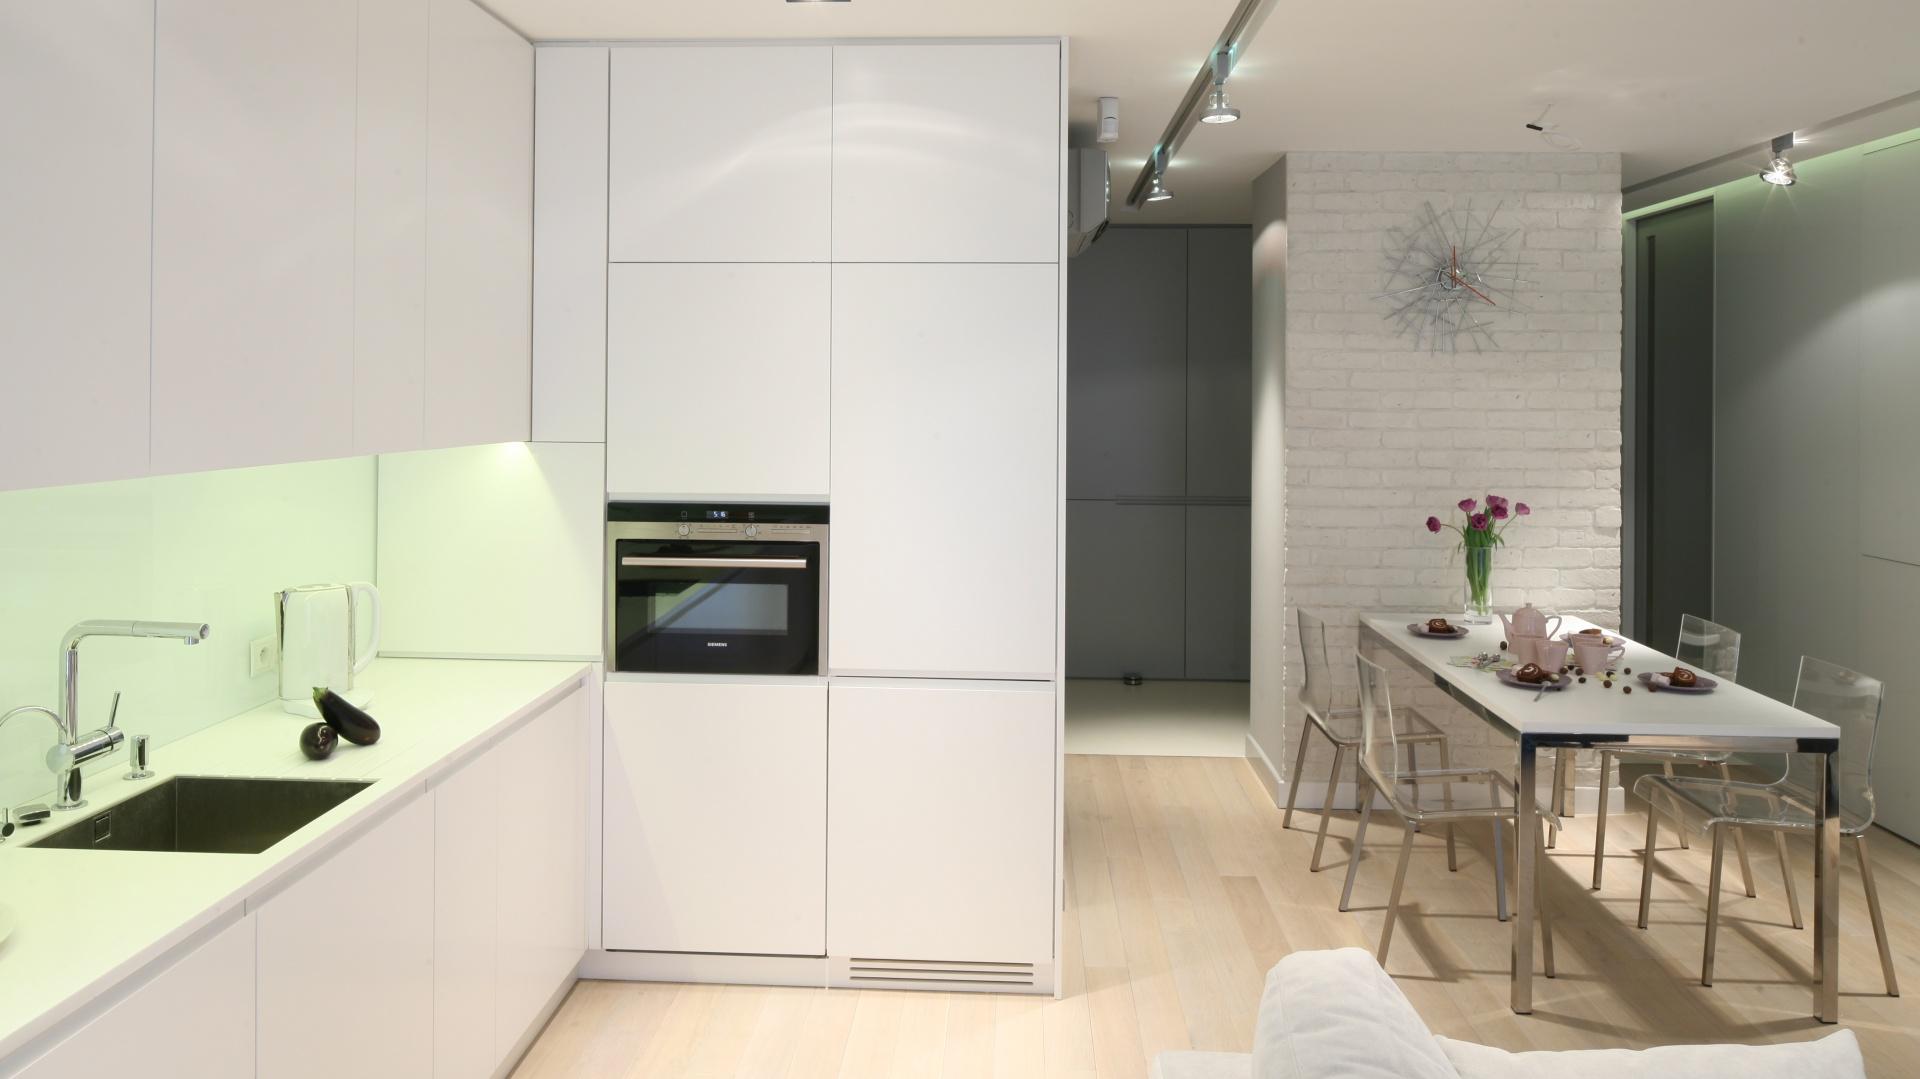 bia�a kuchnia w ceg�a w kuchni galeria pomys�243w